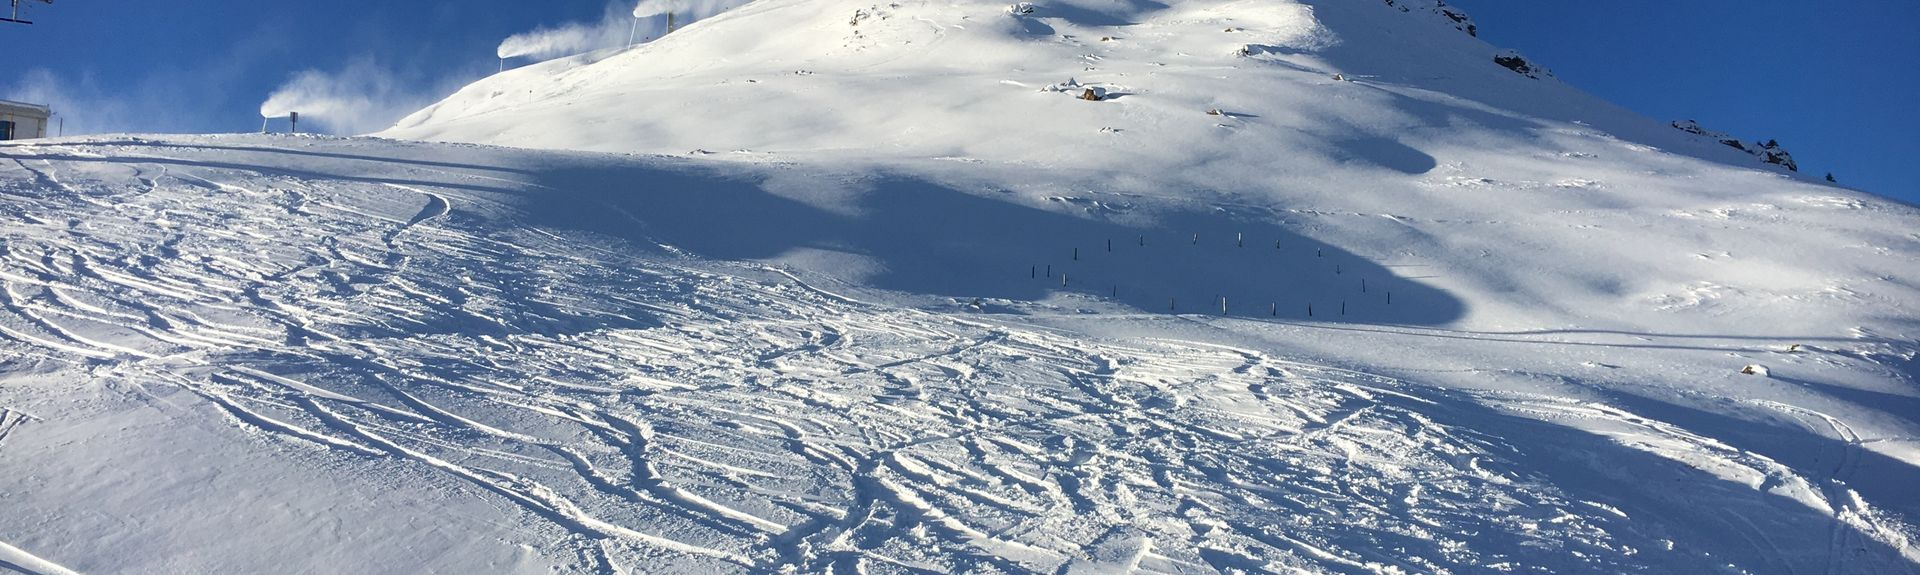 Kaiserwinkl, Tyrol, Autriche